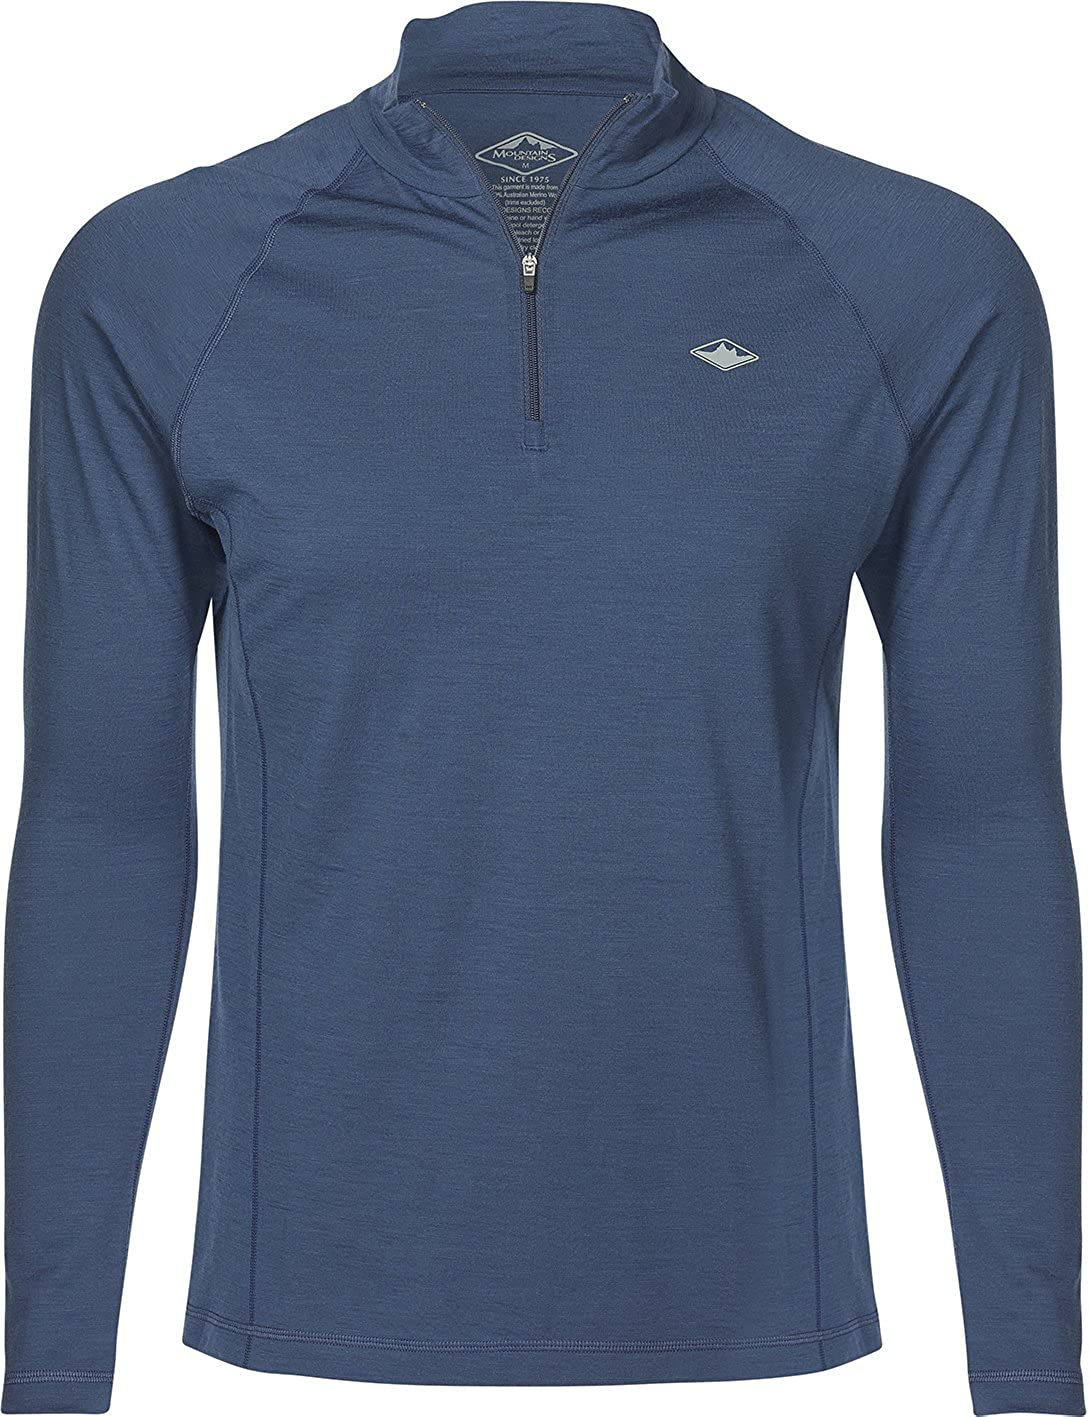 Mountain Designs Mens Merino Wool 1//4 Zip Long-Sleeve Baselayer Top